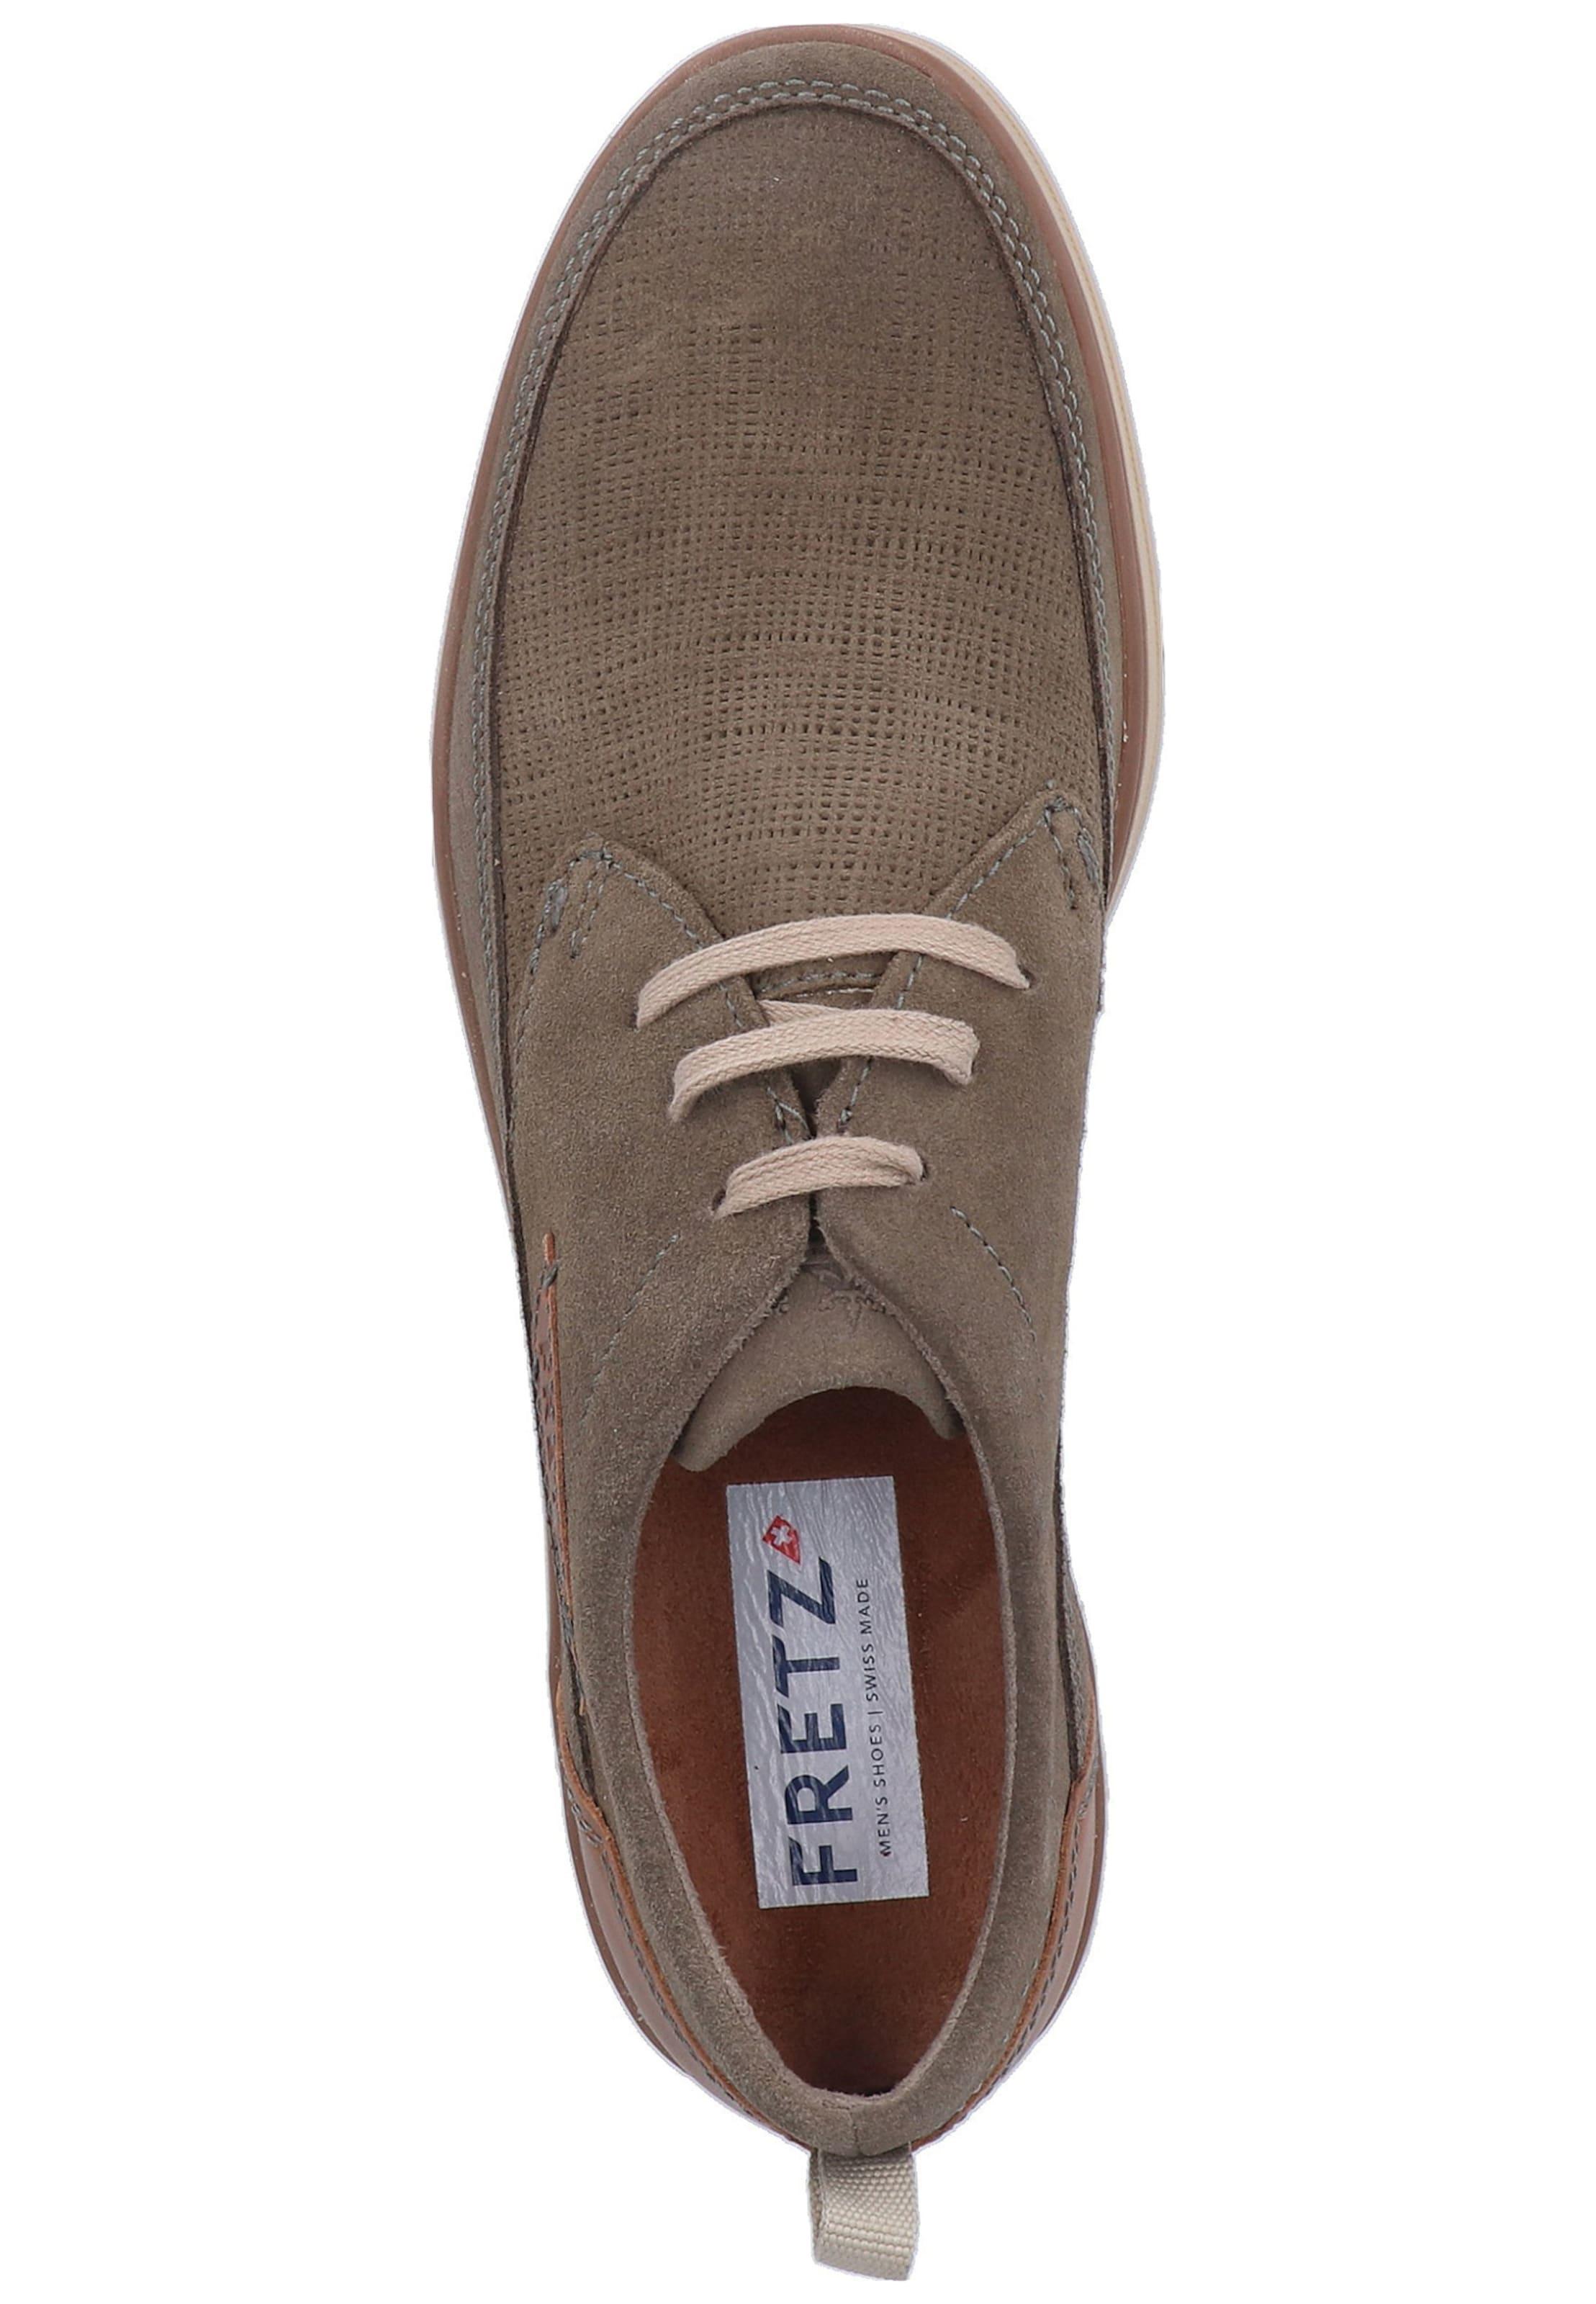 En MarronBronze Men Lacets Fretz Chaussure À lFu3TK1Jc